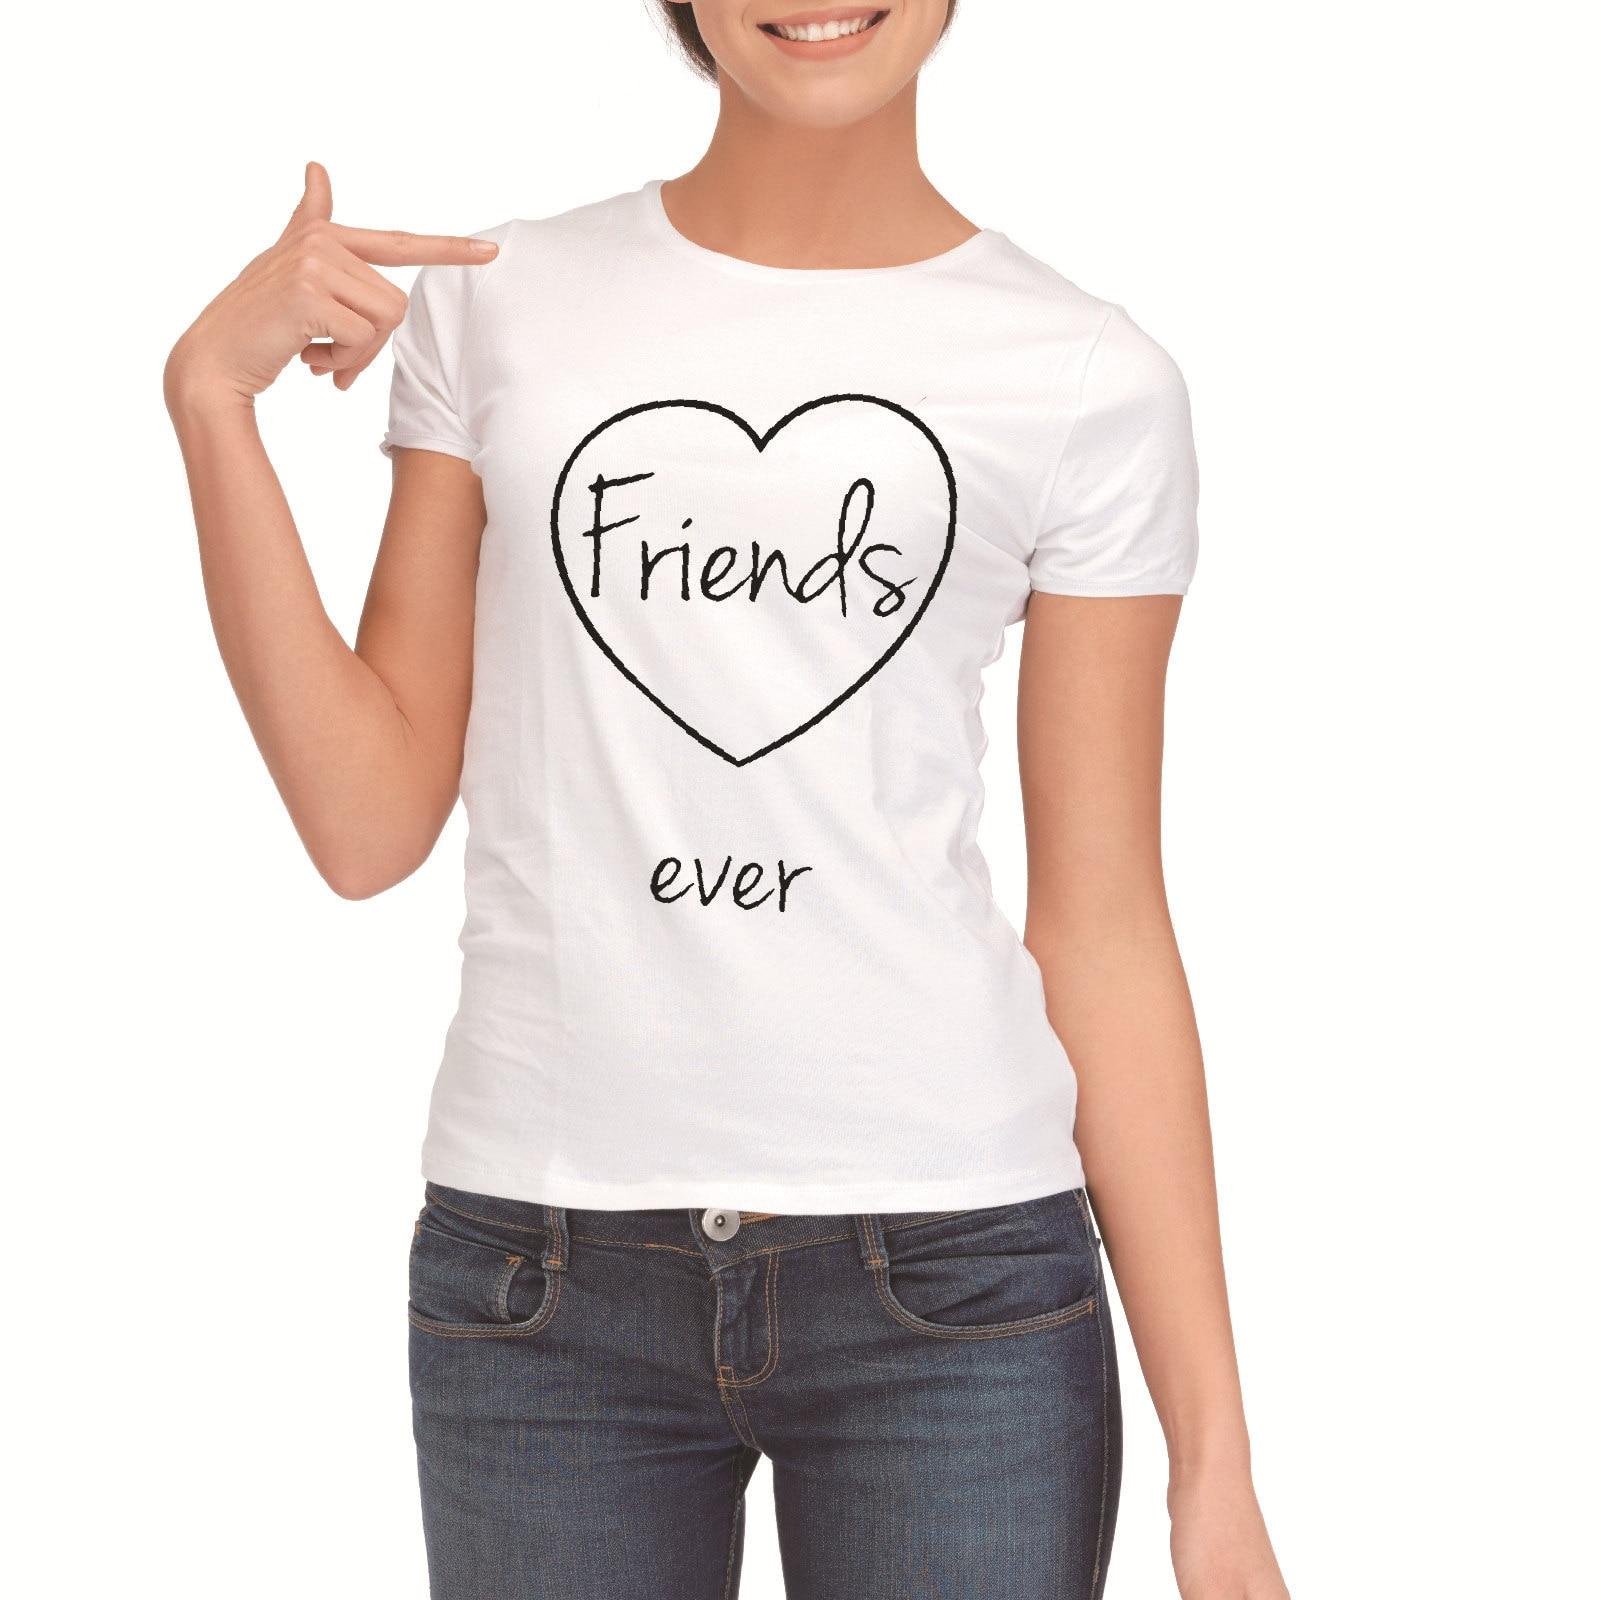 Femme Best Friends Matching T-shirts Fashion Girls Forever T Shirt Women 2018 Cotton sisters Tee